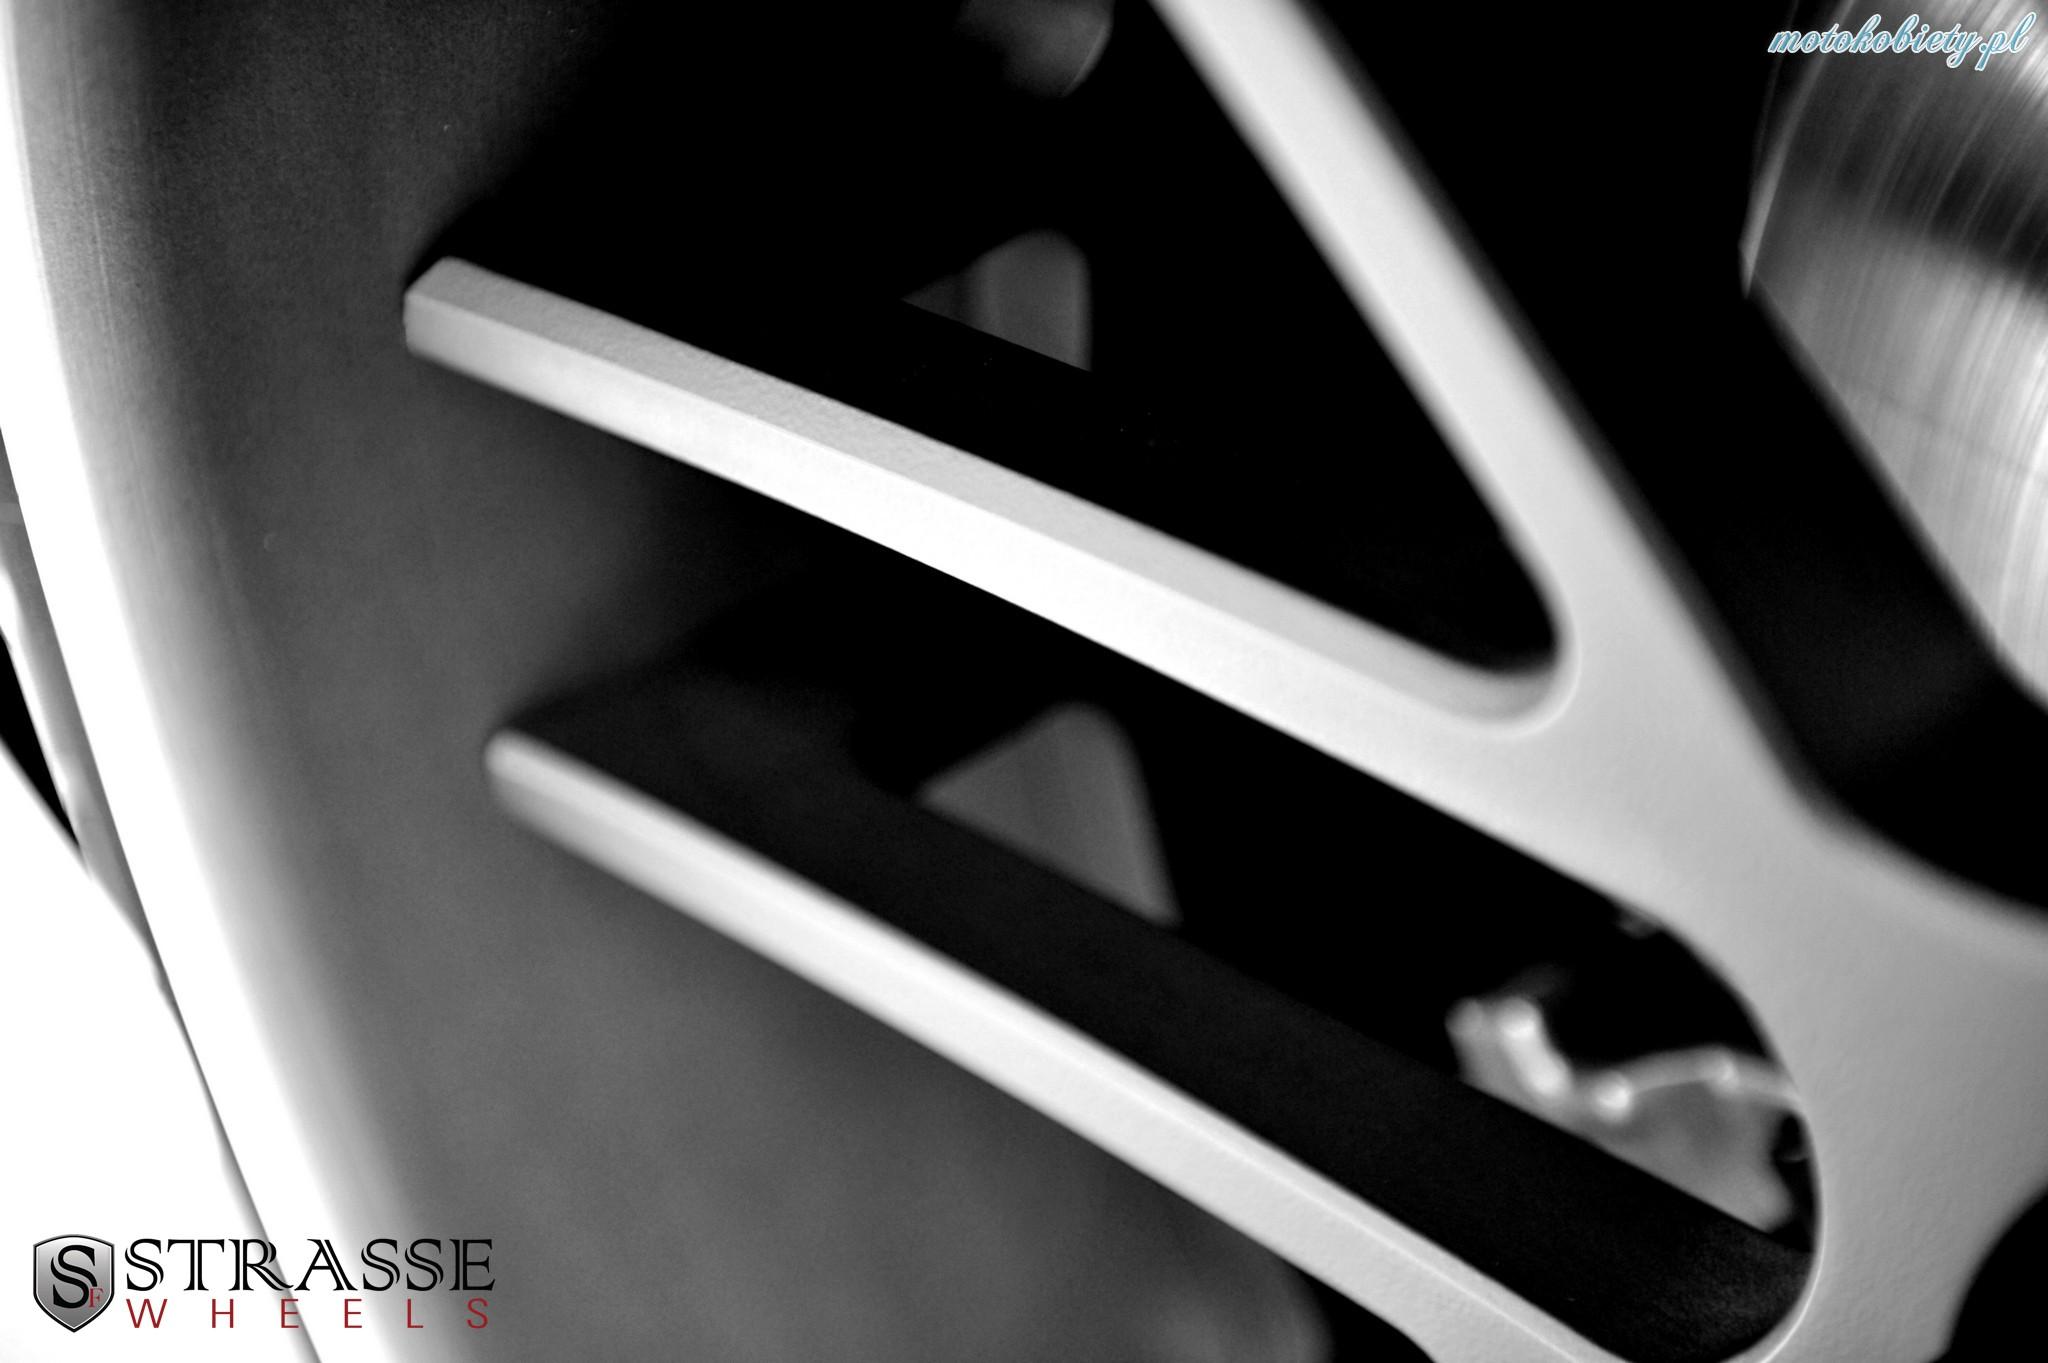 BMW X6M Strasse Forged Wheels